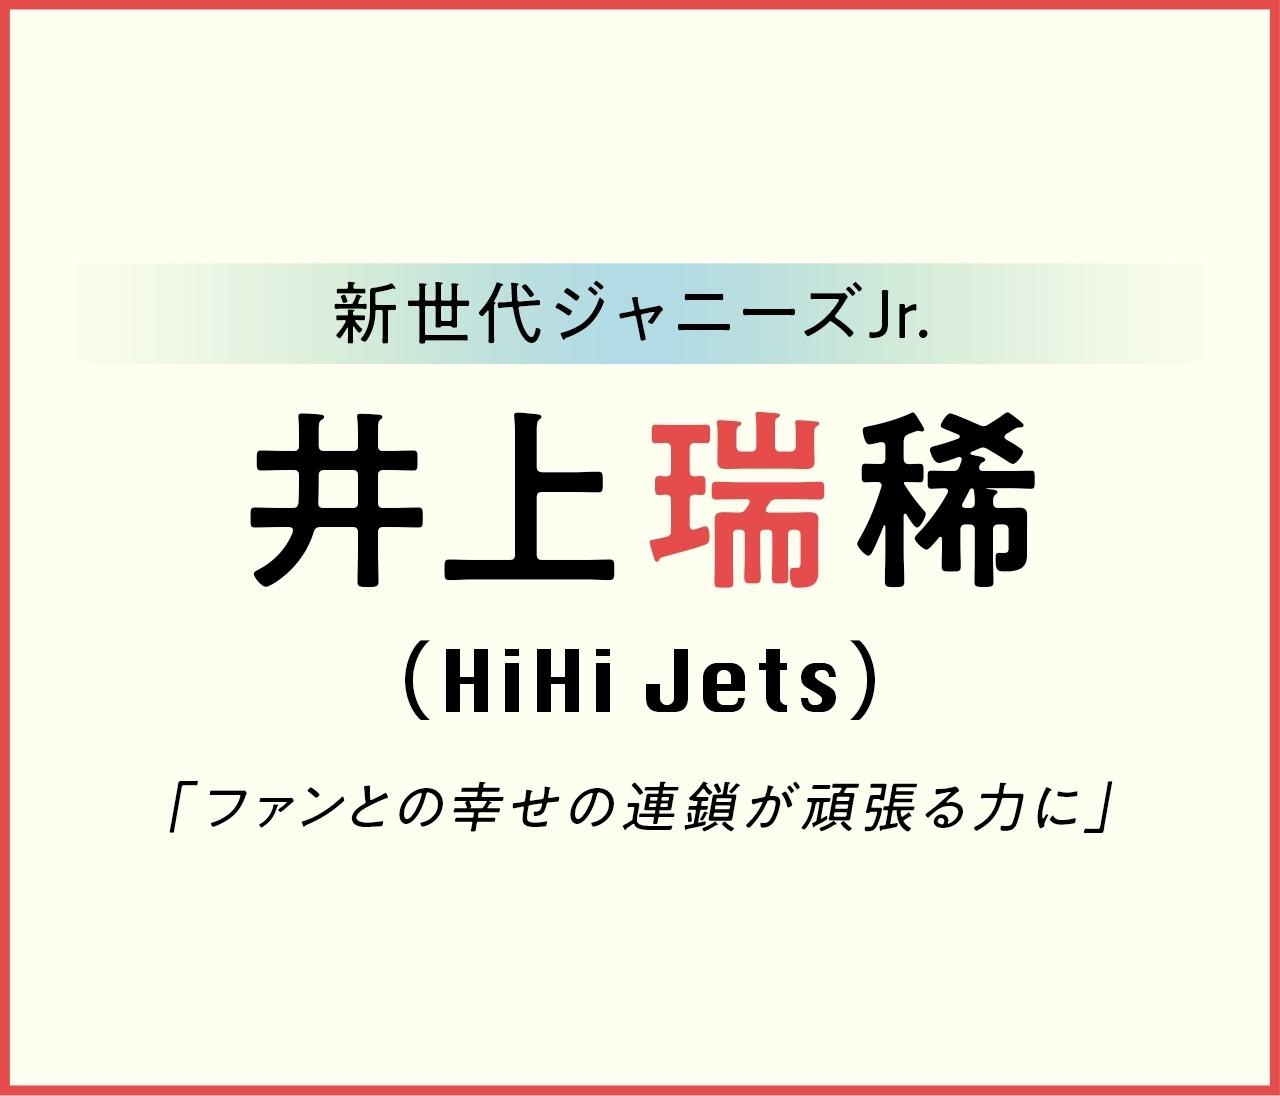 HiHi Jets 井上瑞稀がBAILAに初登場!【新世代ジャニーズJr.】